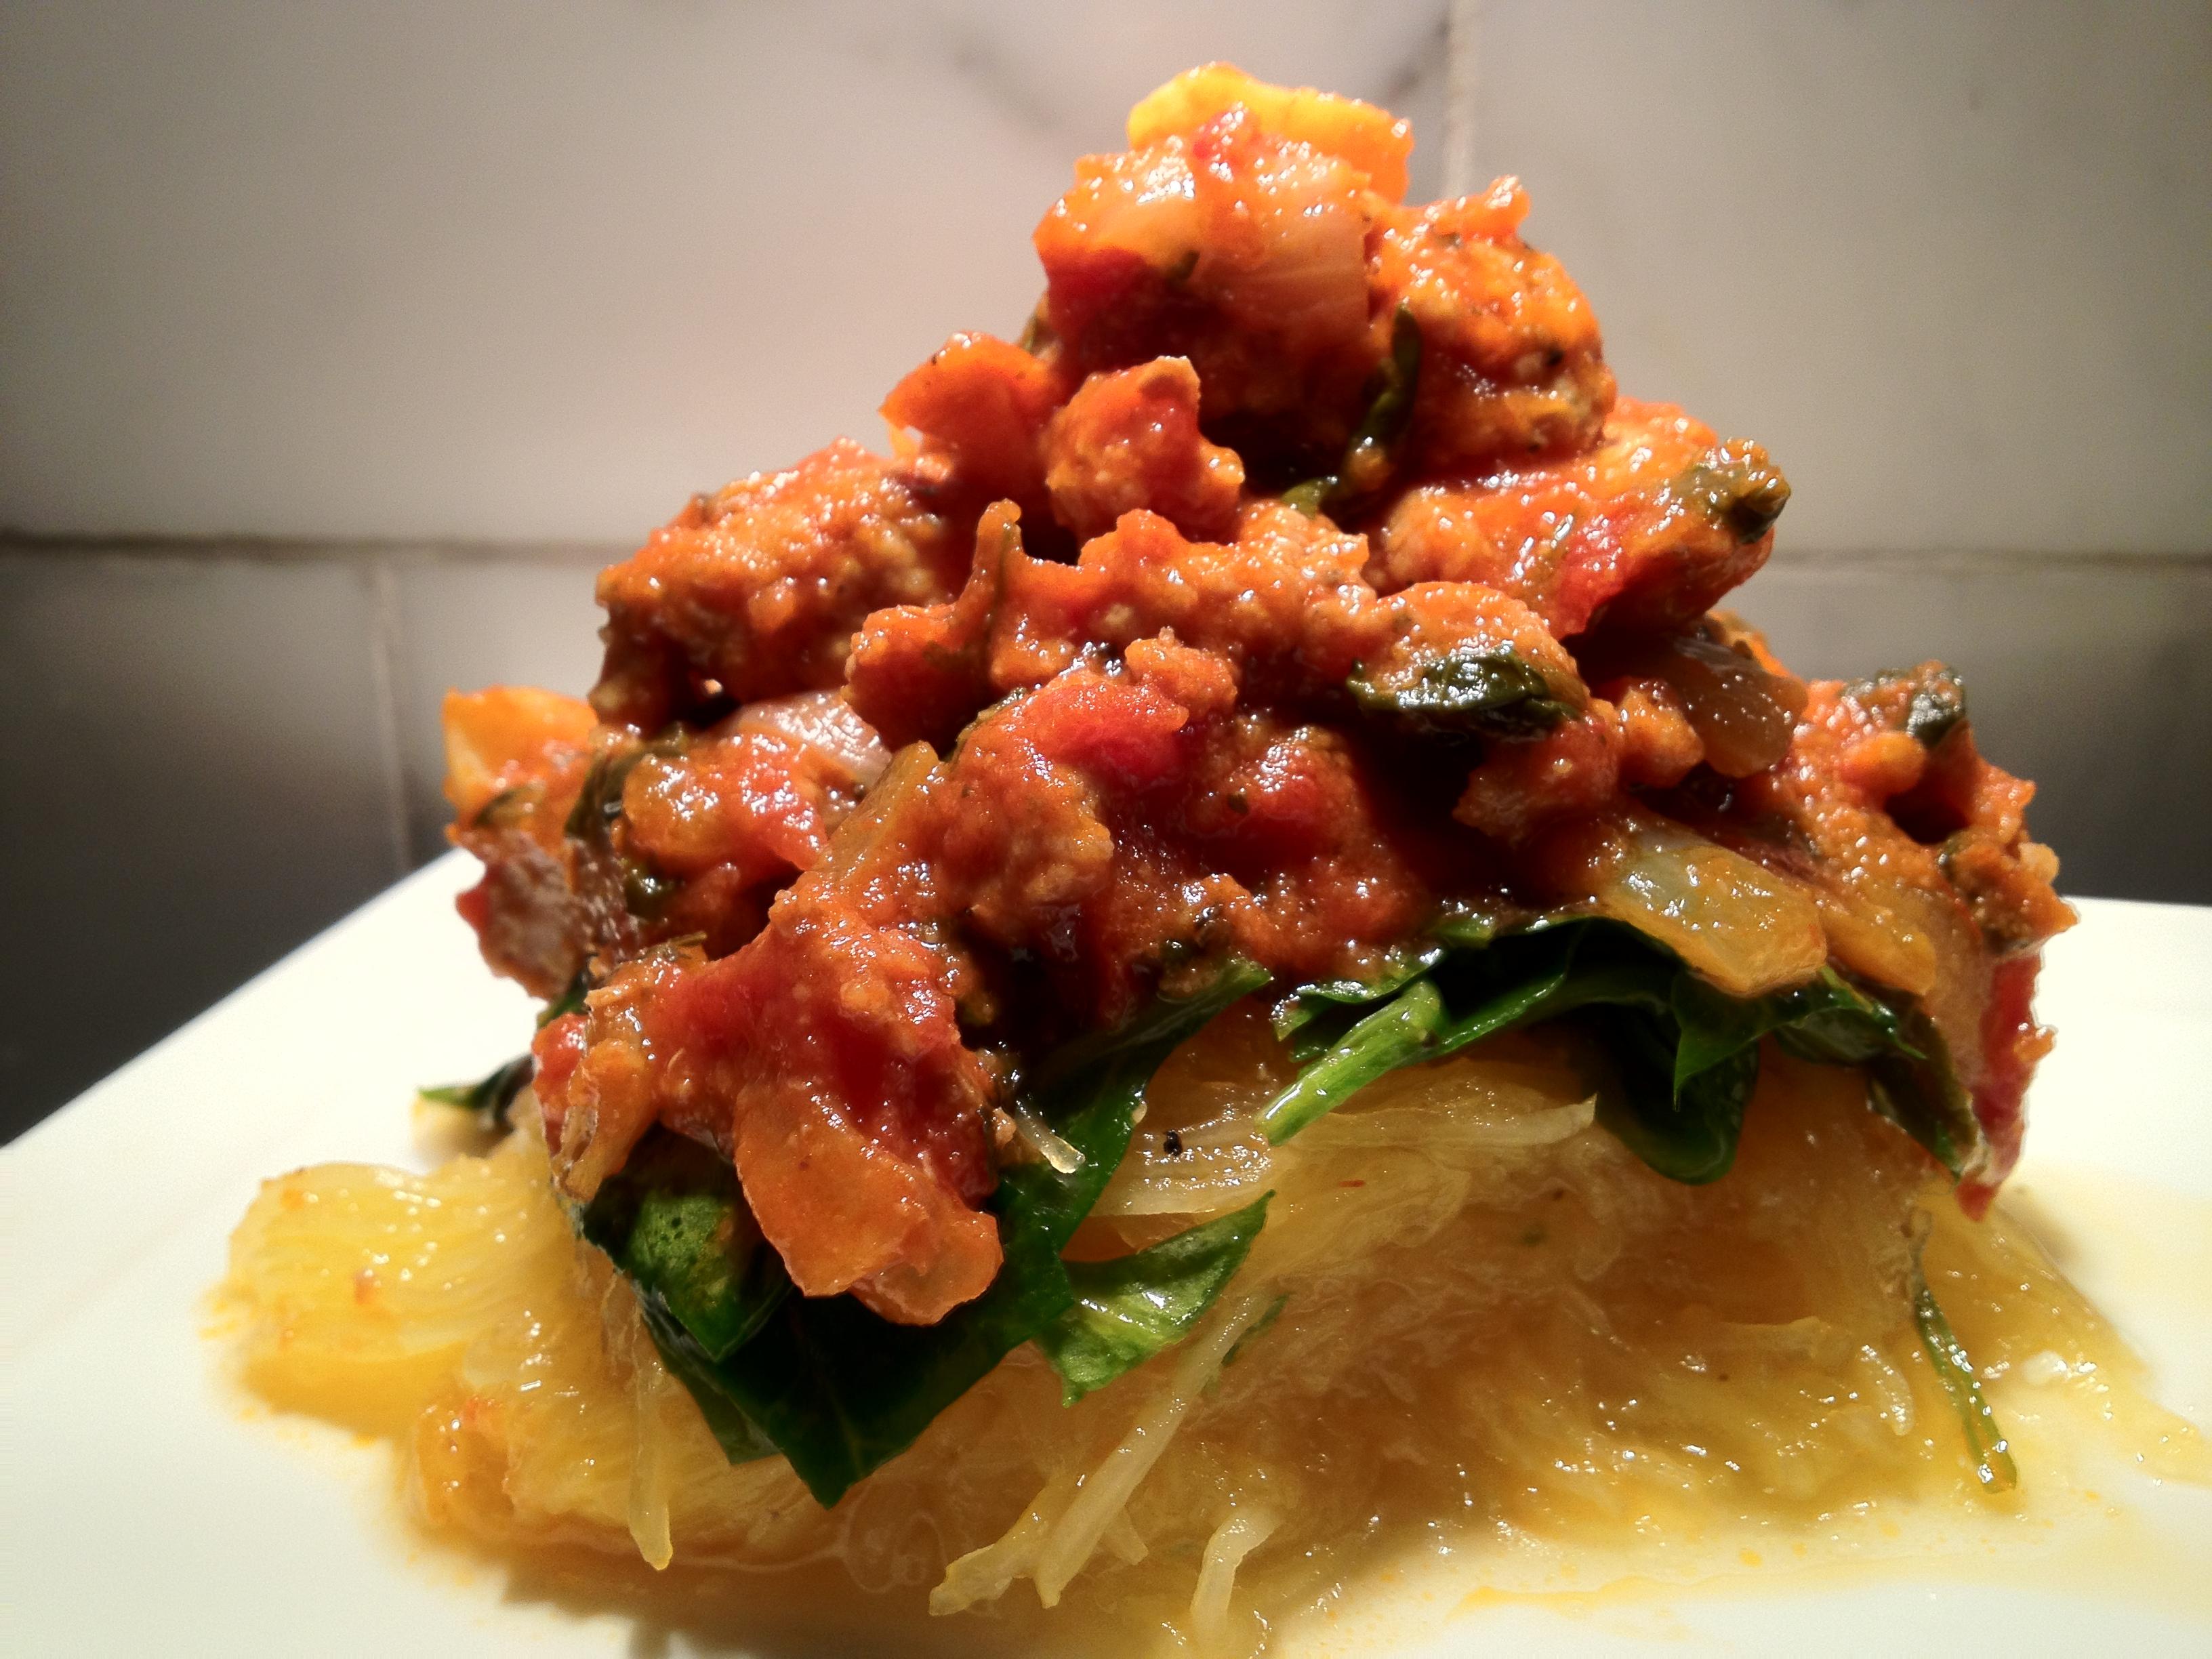 Paleo Lasagna with Boar or Beef